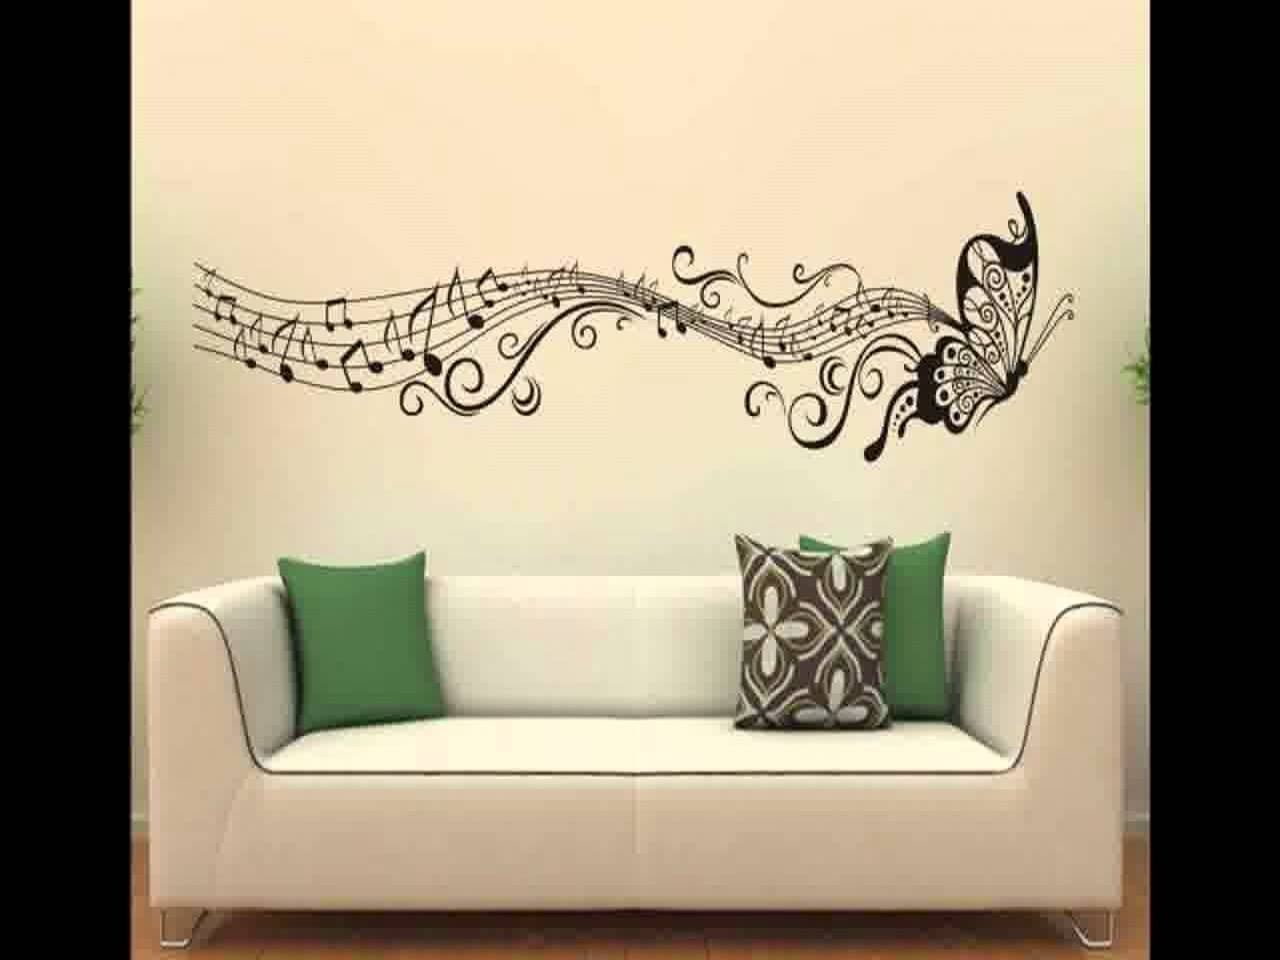 Fashionable Acrylic Wall Art Design Ideas – Youtube For Acrylic Wall Art (View 4 of 15)